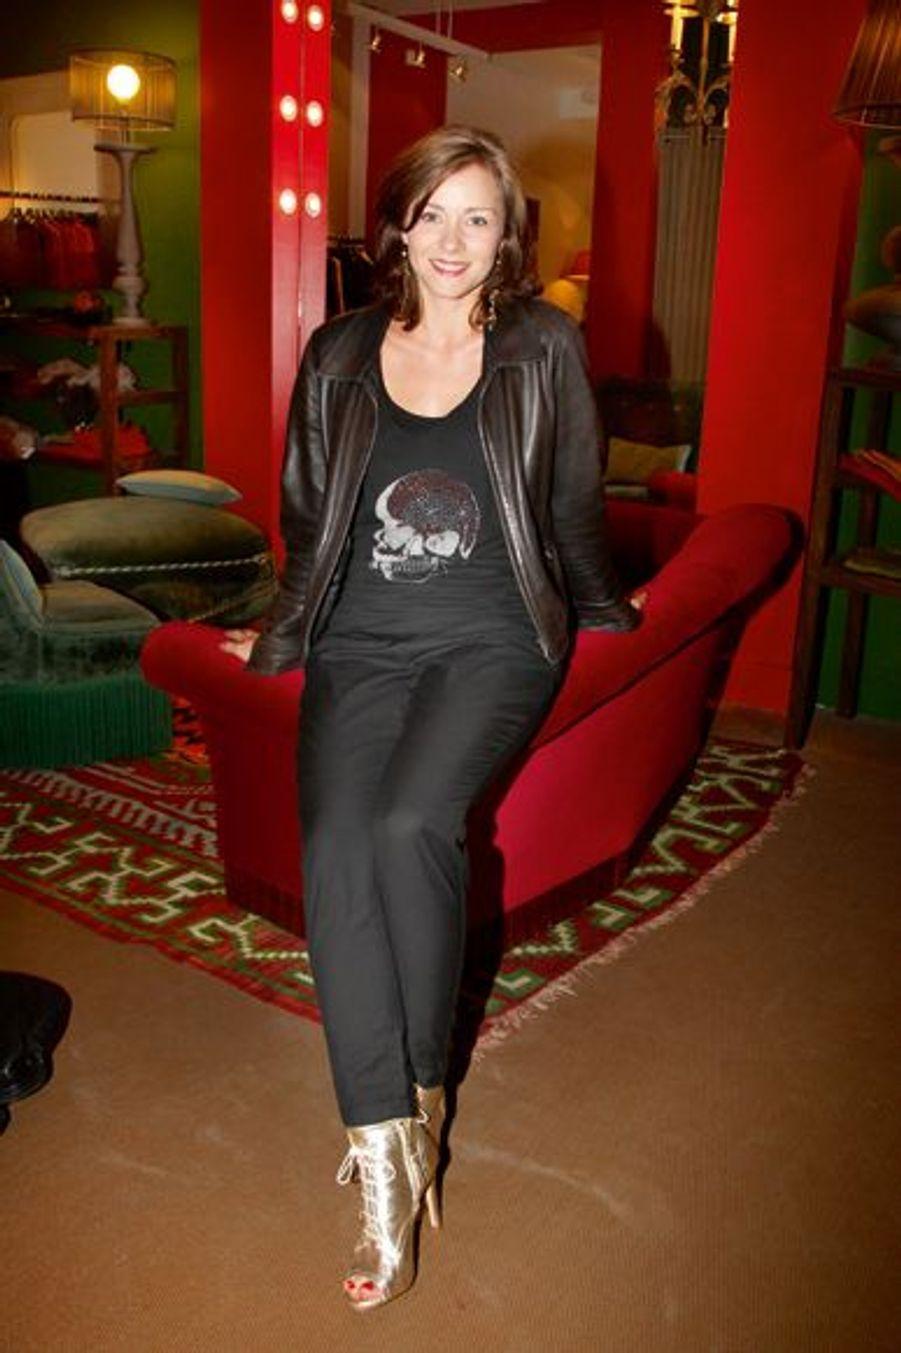 Delphine Depardieu